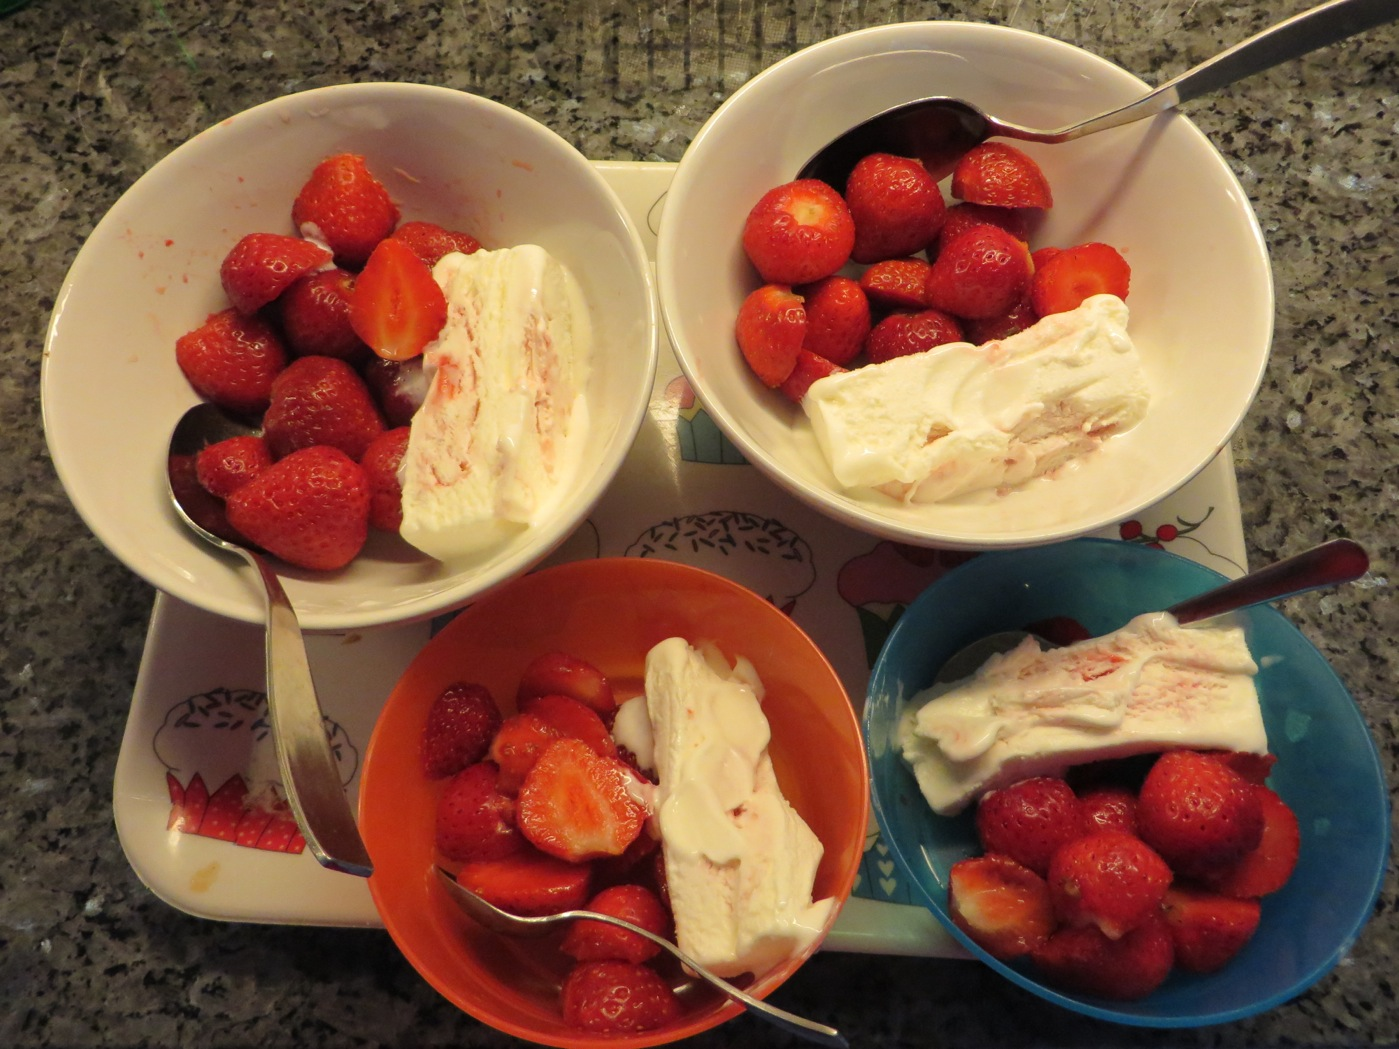 Jordgubbar och glass